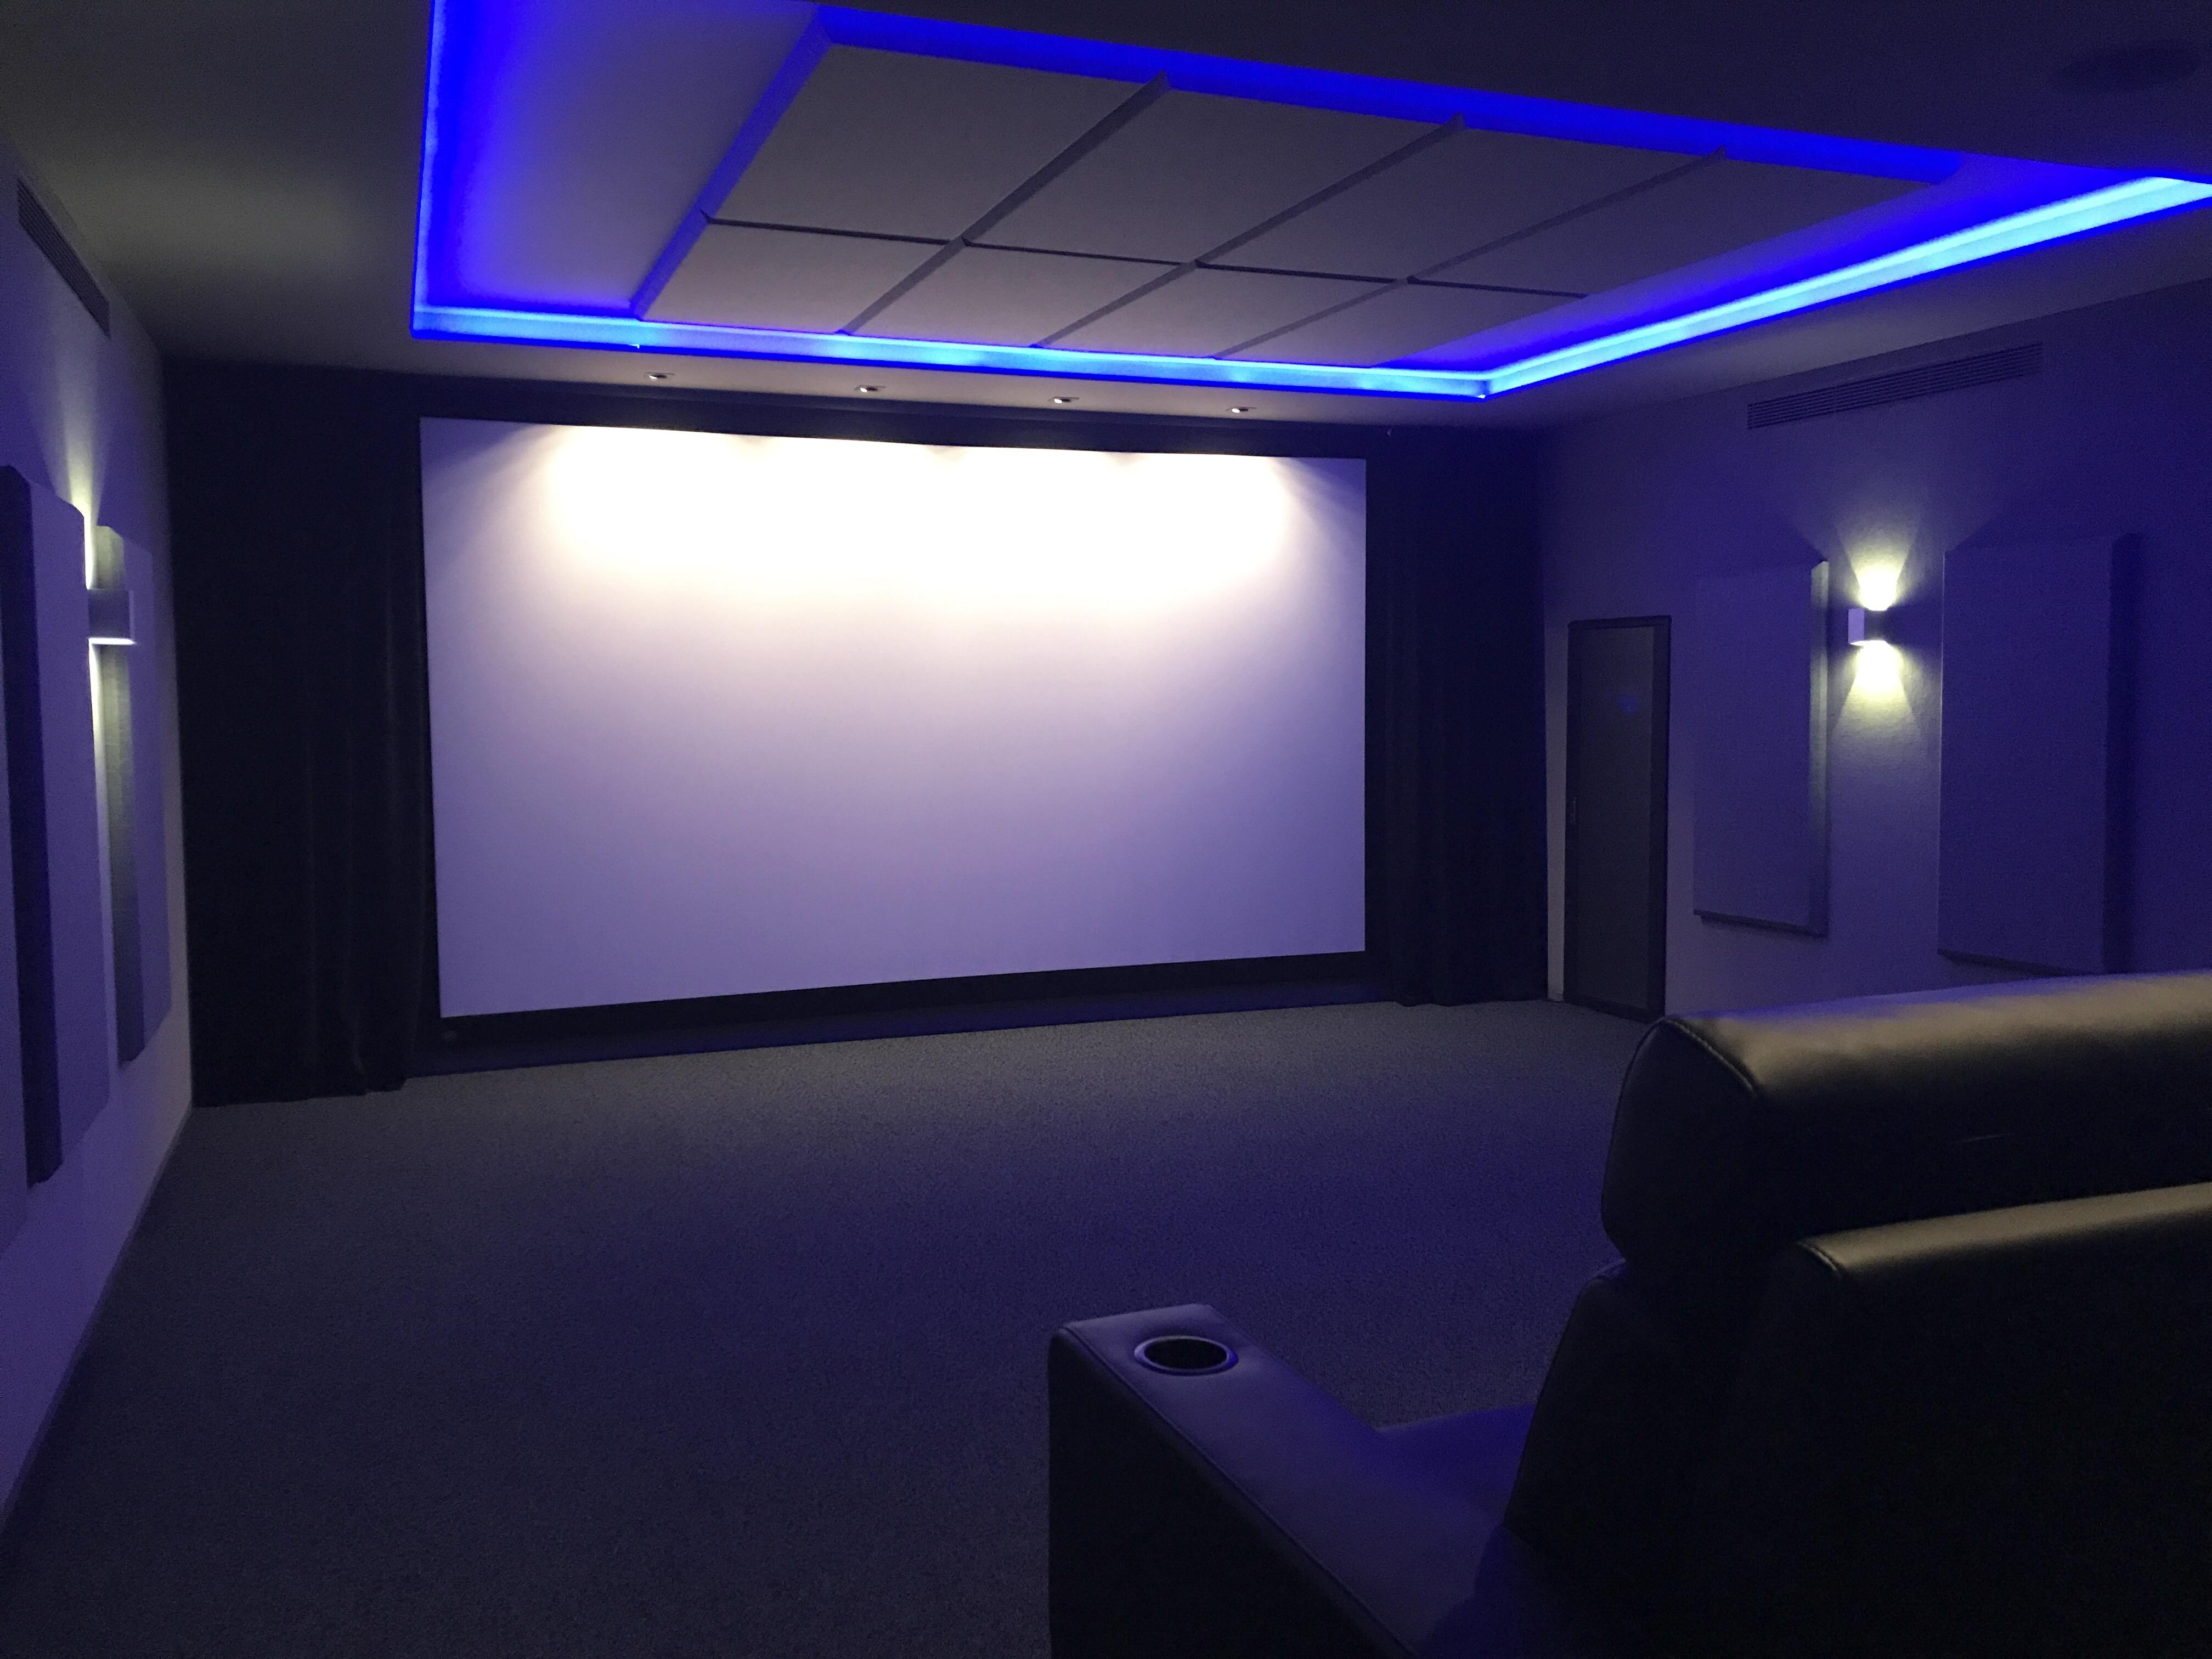 Kcsspeakers Kcs Home Cinema -> Imagem De Sala De Cinema